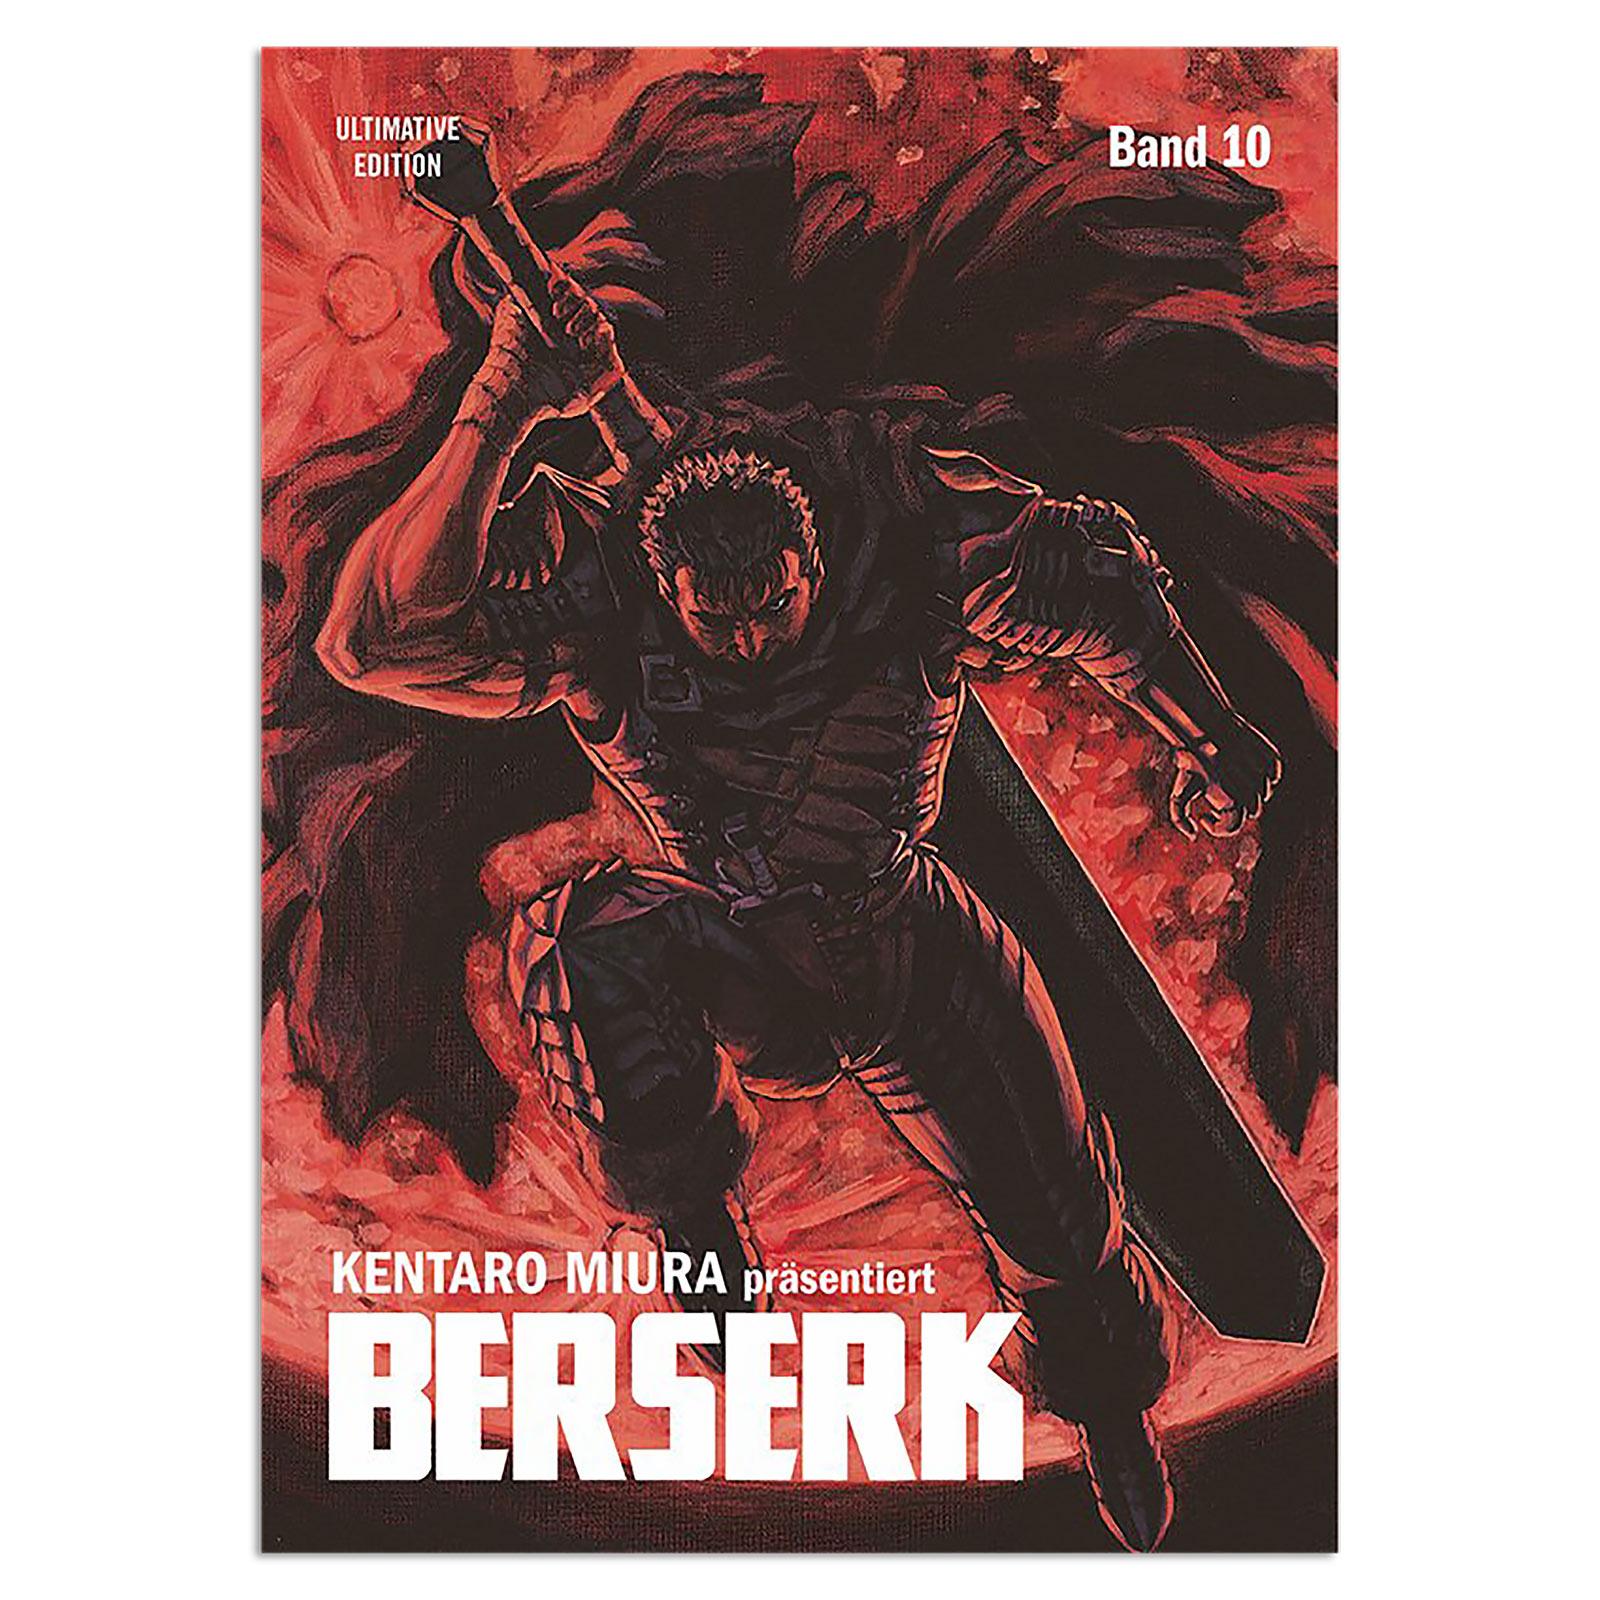 Berserk - Manga Band 10 Ultimate Edition